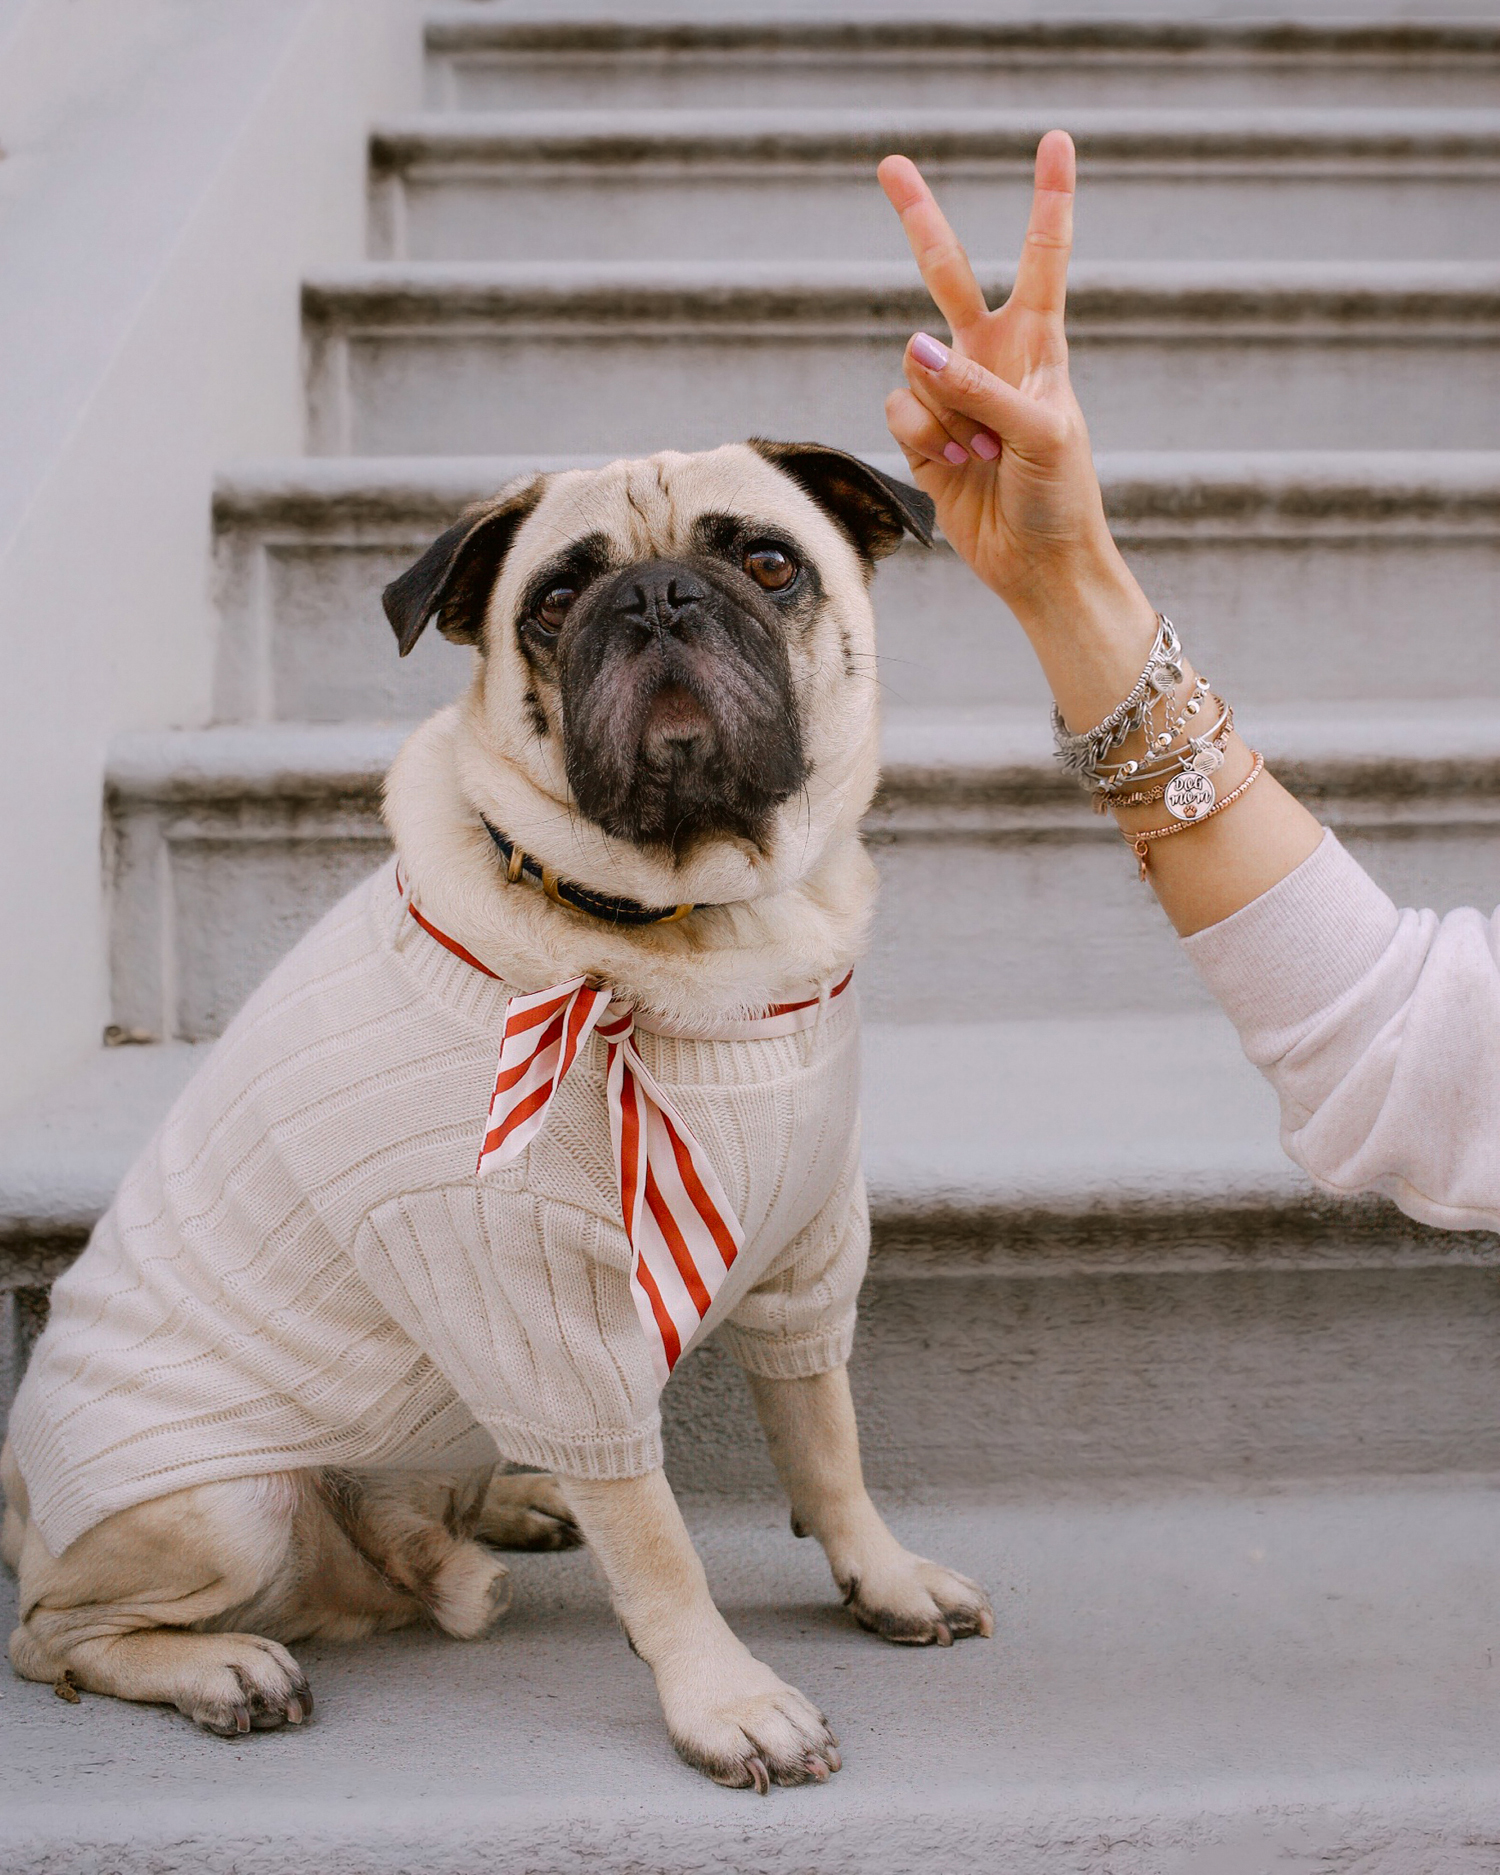 honeyidressedthepug-aleaandani-motherdaycampaign-dogmom-blog-mothersday2019-dogblog-newyorkdogs-nycdogmom-twinningwithmydog 10.jpg